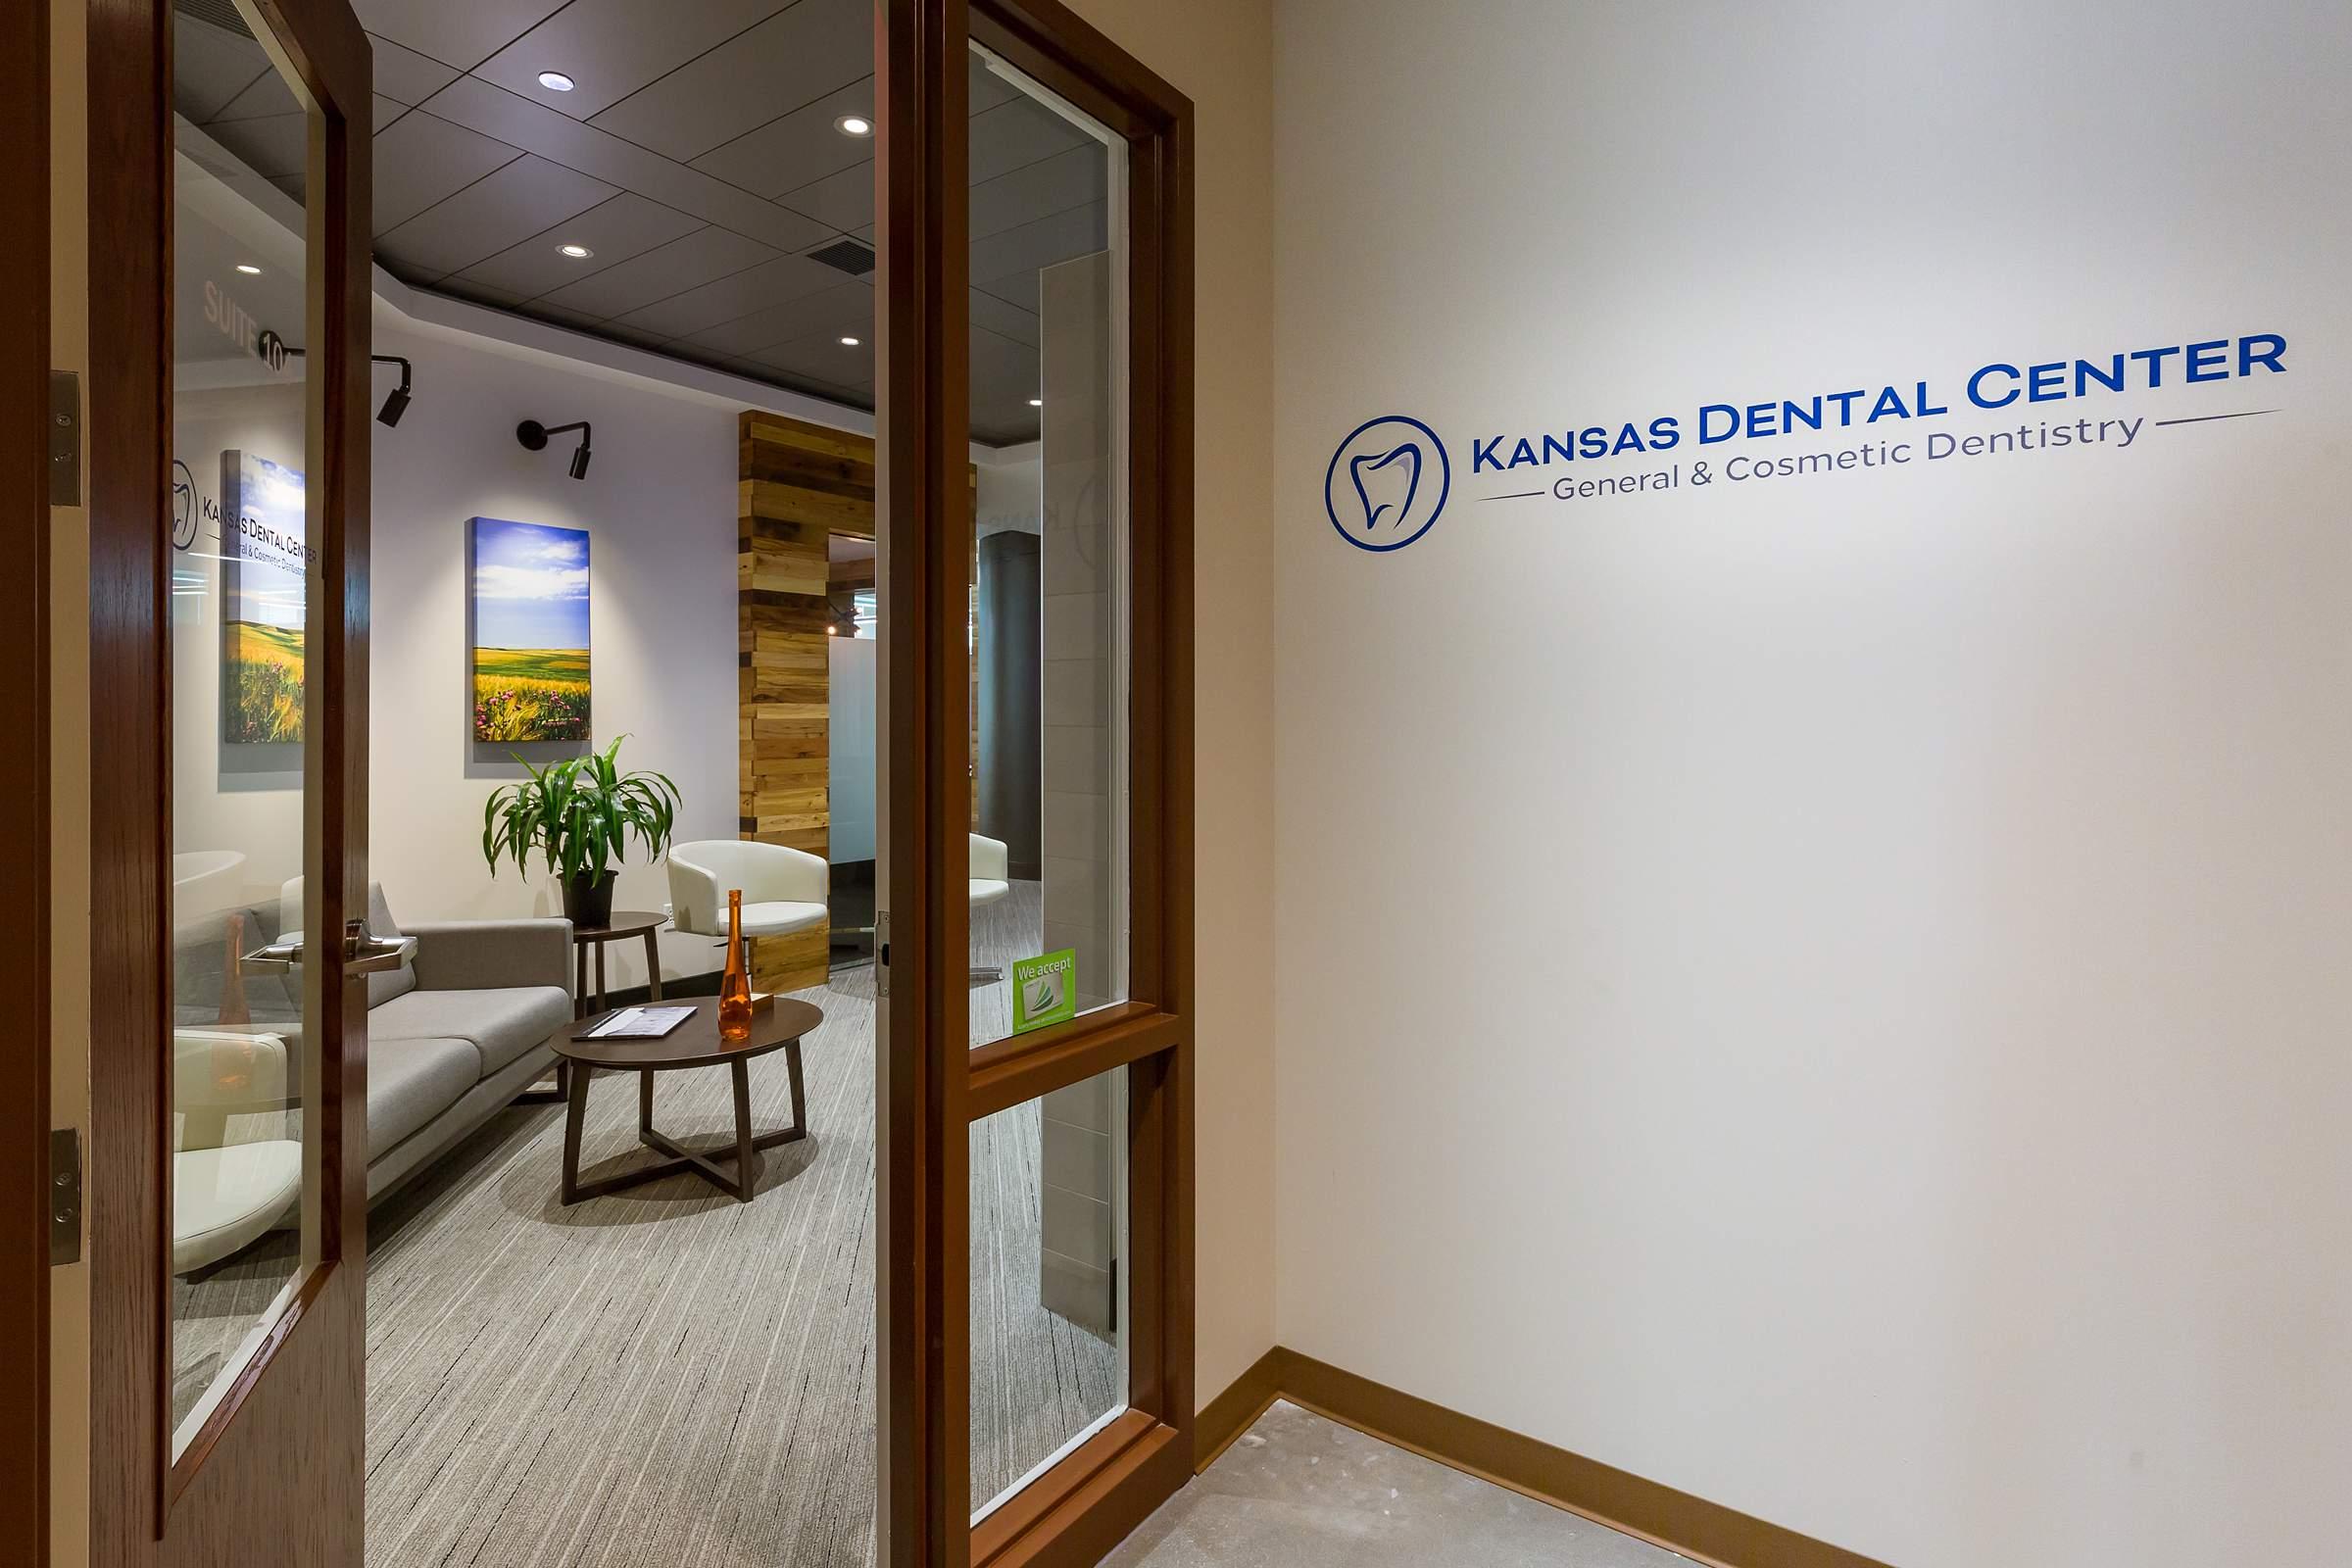 Kansas Dental Center - Medical Facility Virtual Tour by